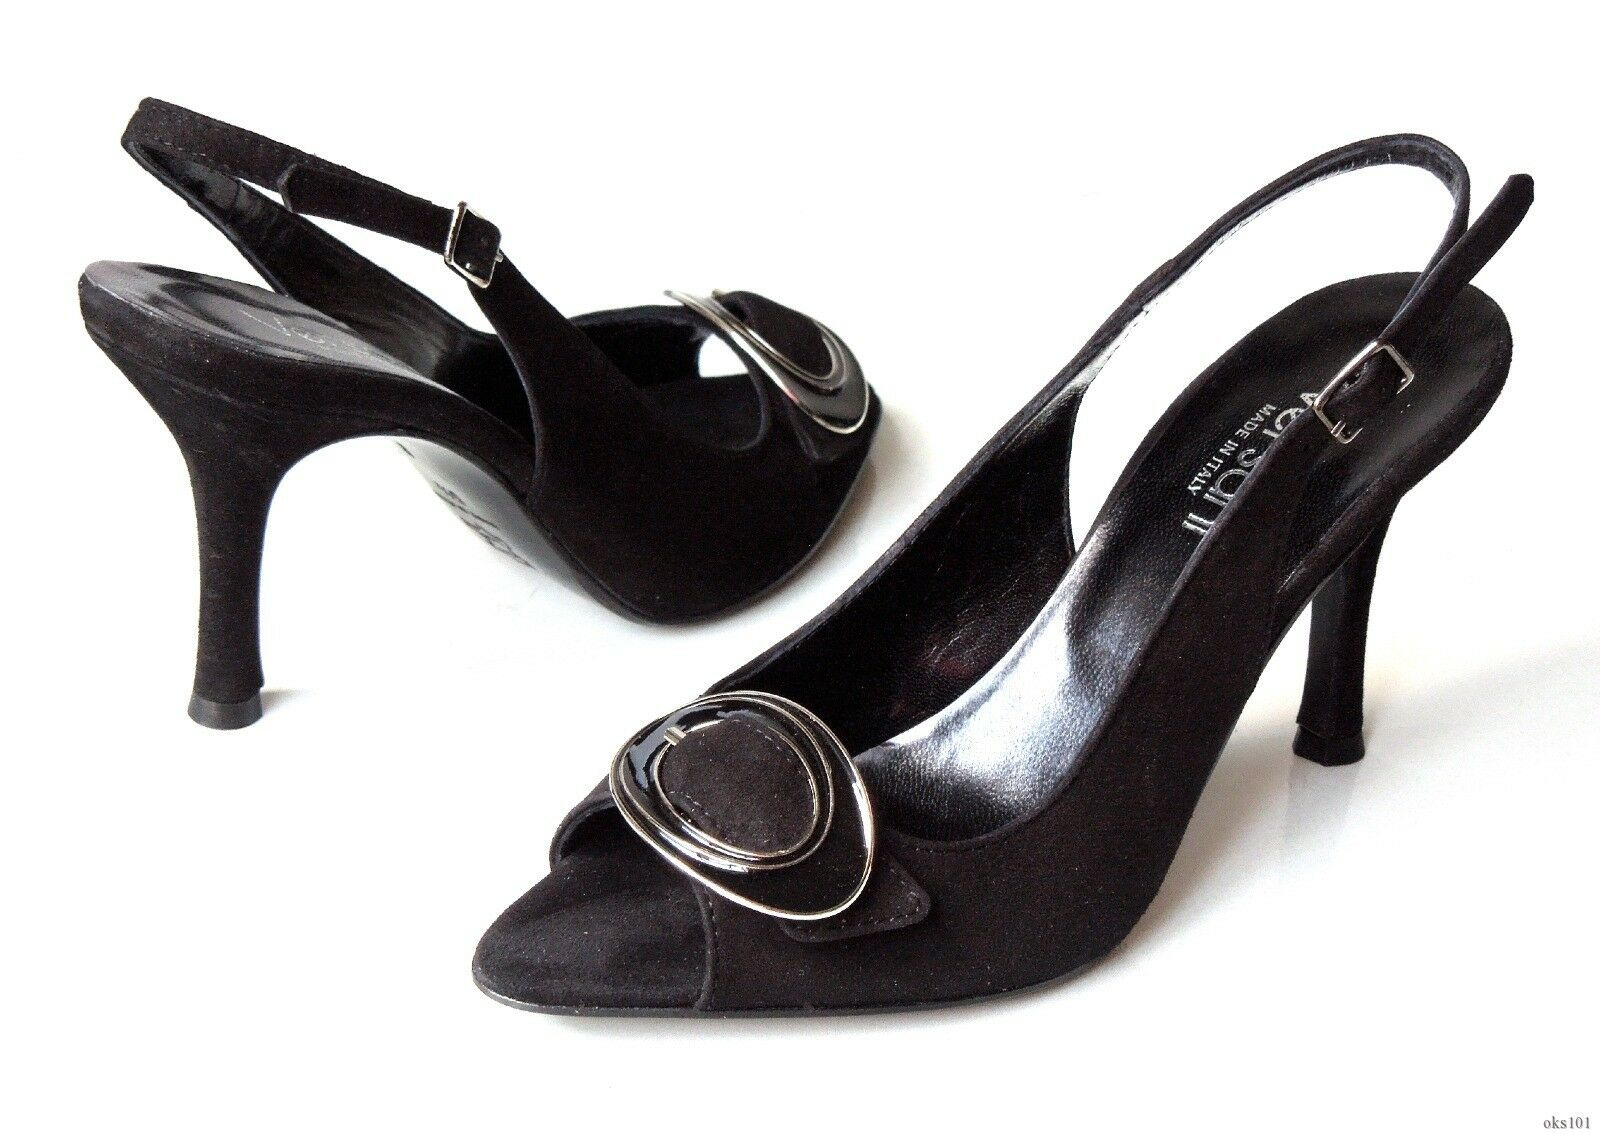 New Versani 2041 schwarz suede open-toe BUCKLE slingback PUMPS schuhe  - sexy